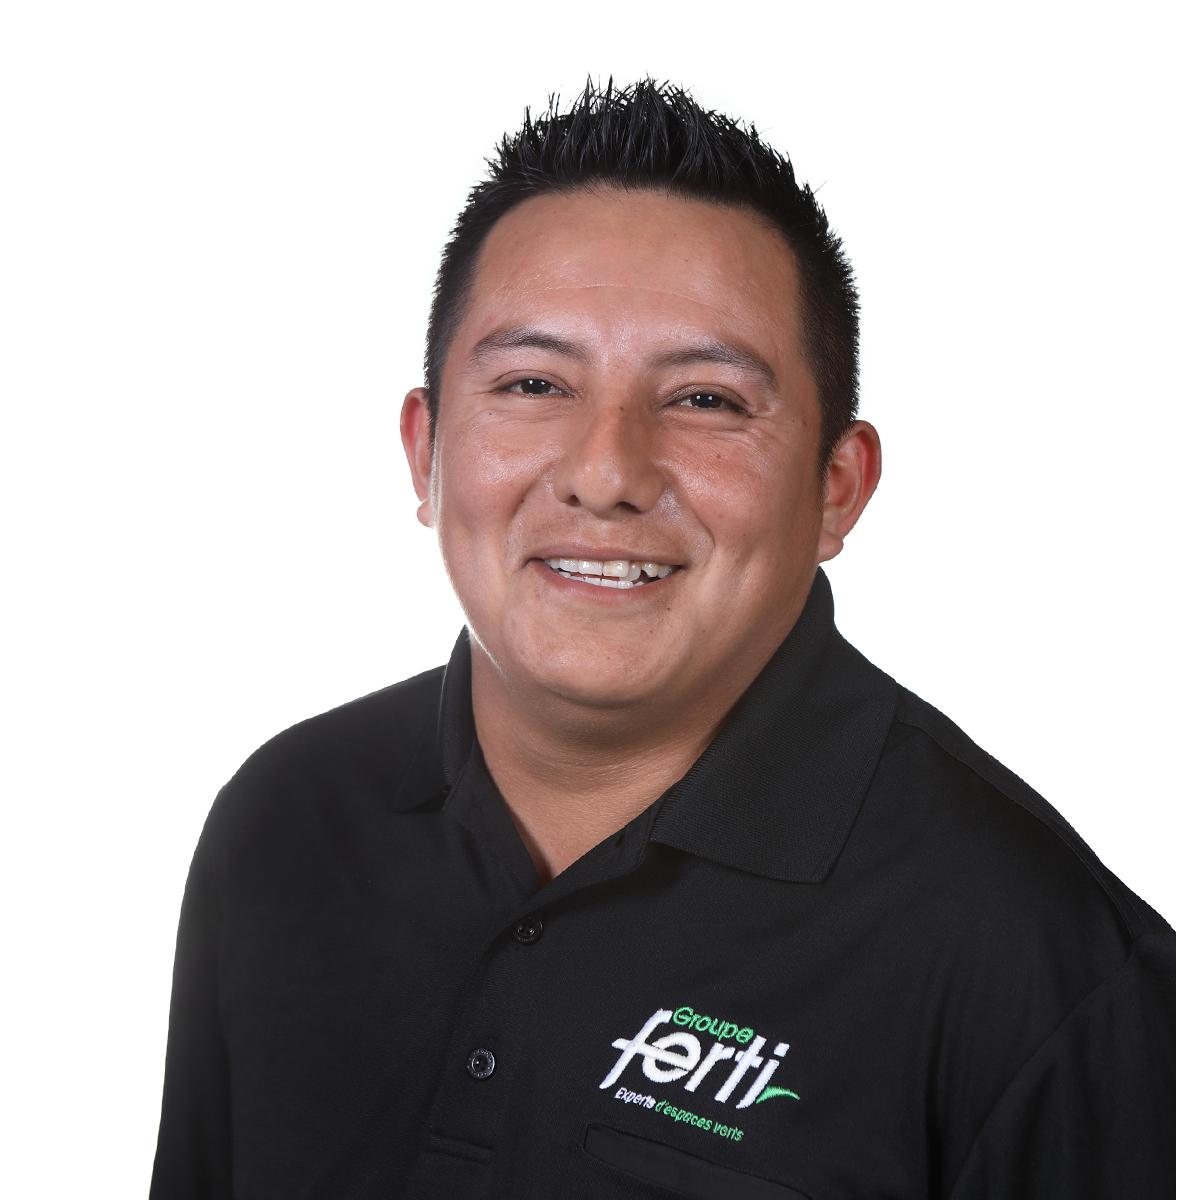 Oliverio Vichiqui Ramirez